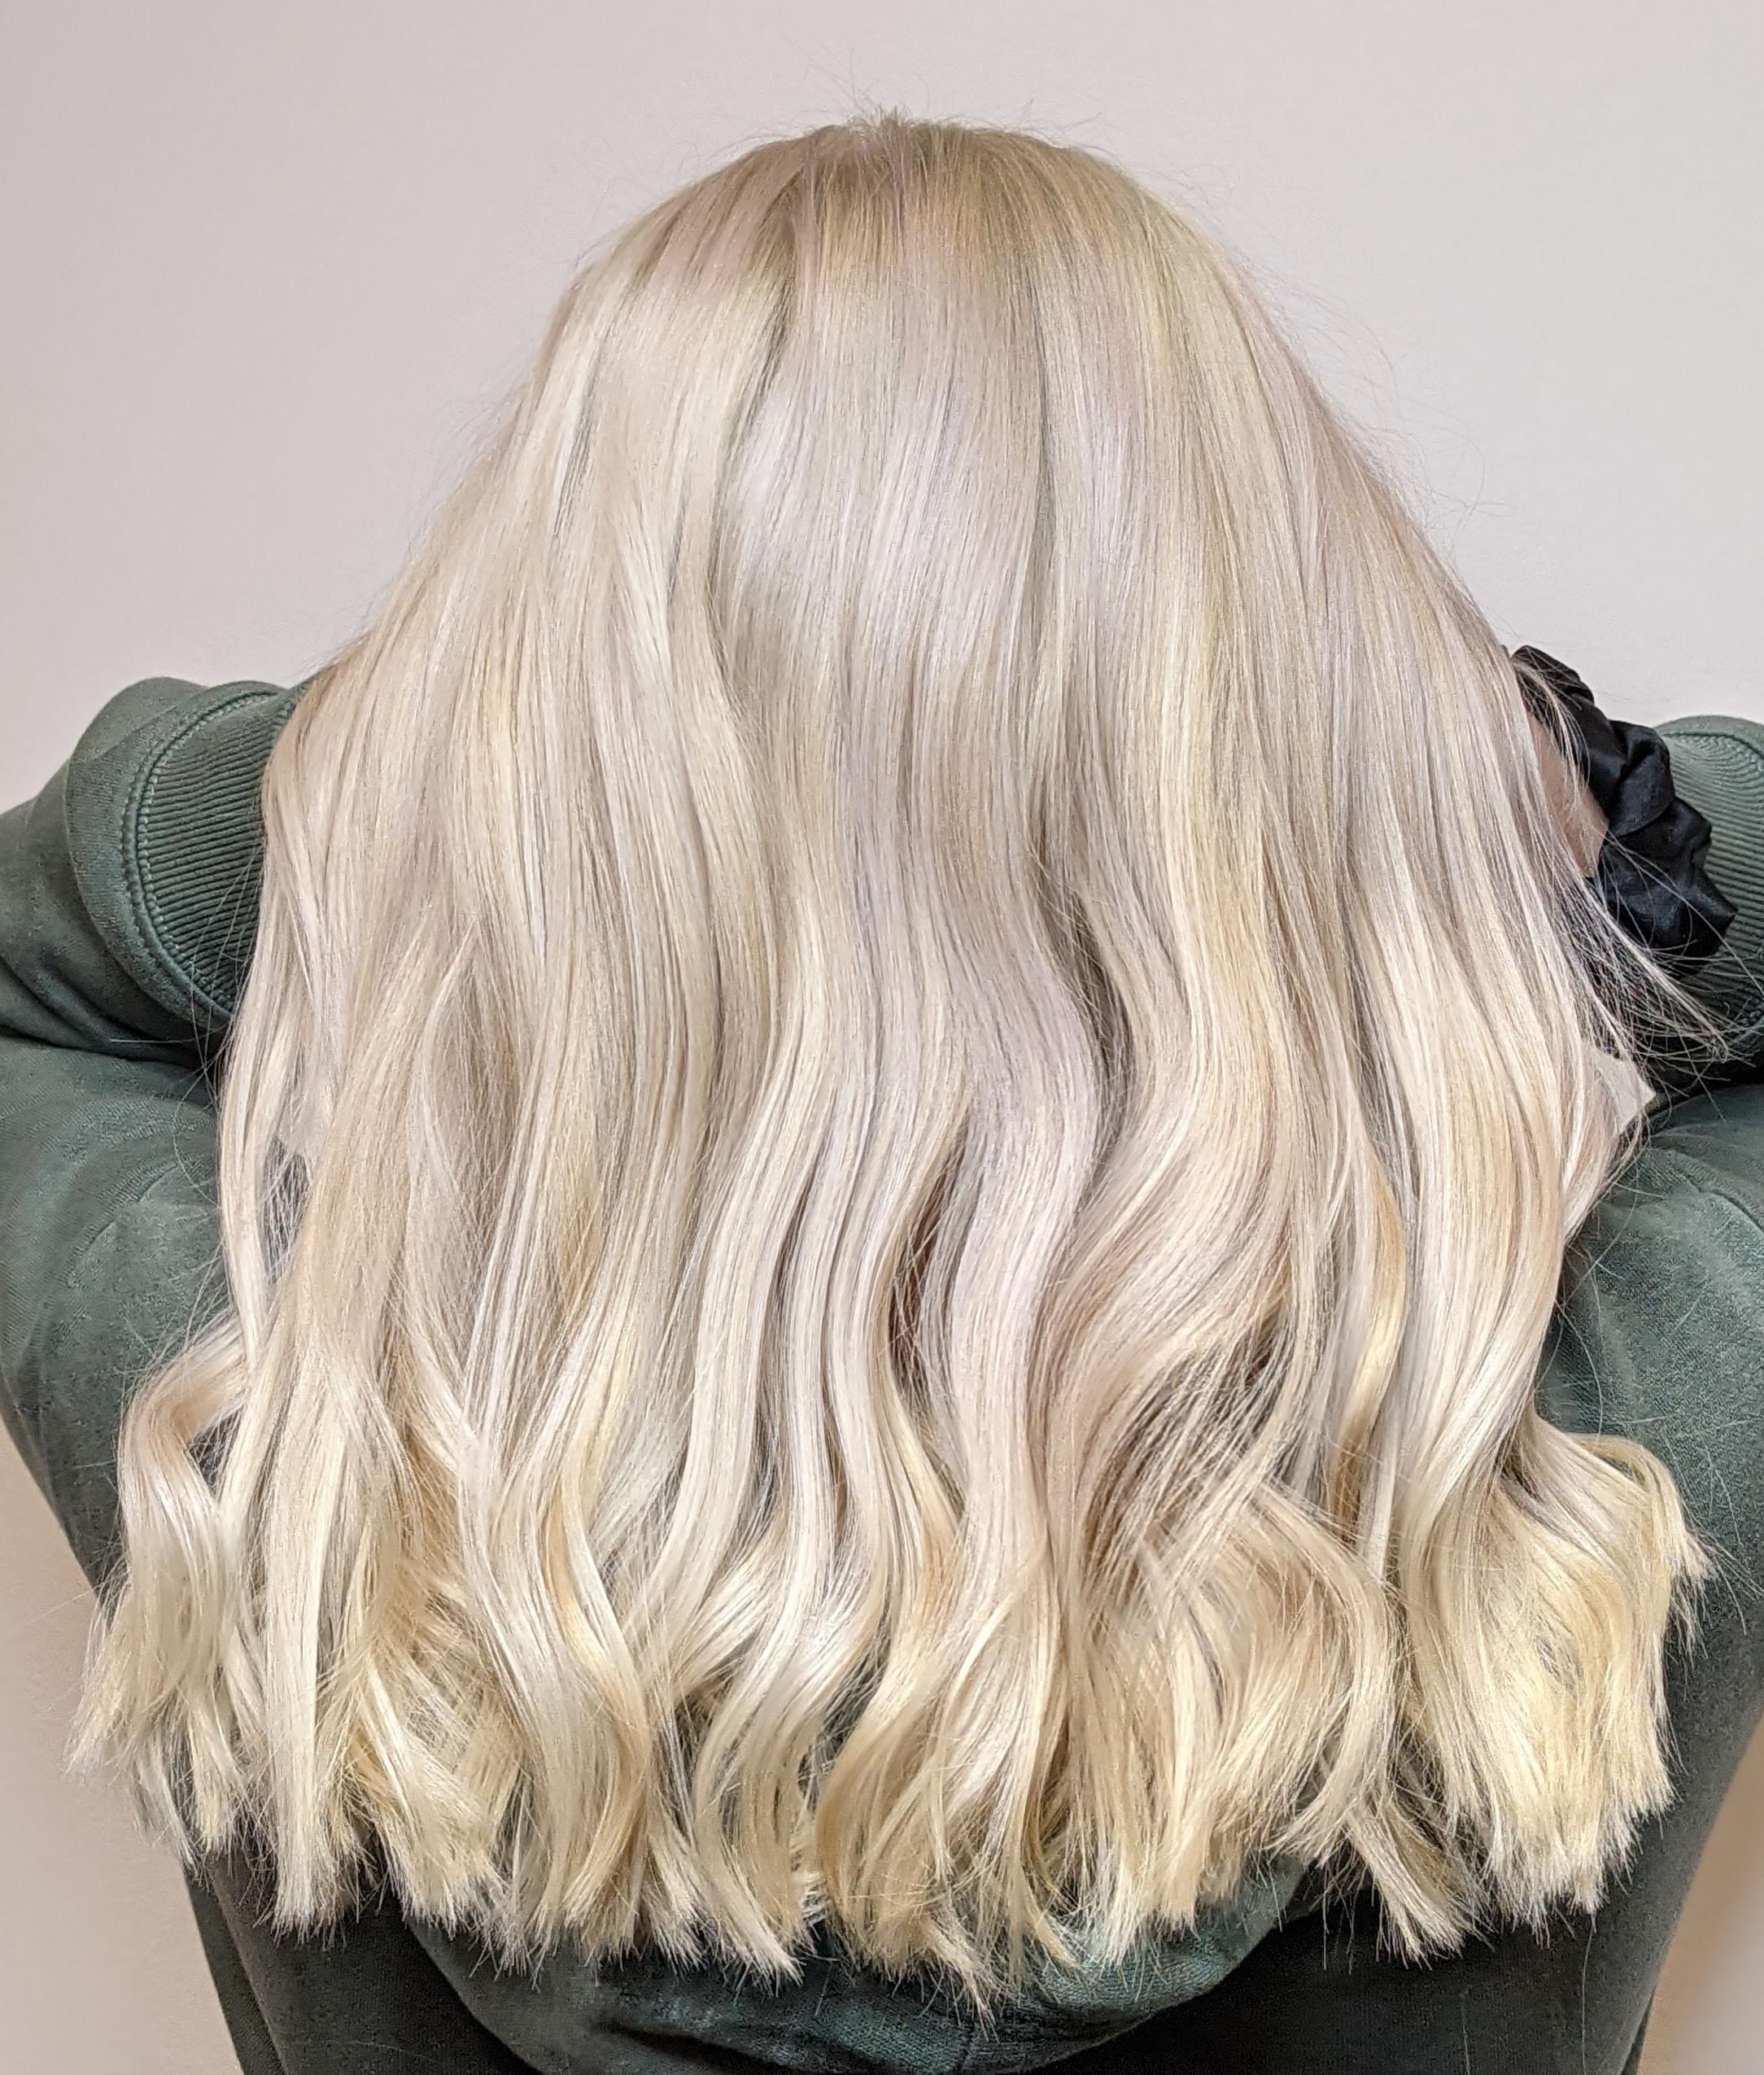 platnium-blonde-hair-color